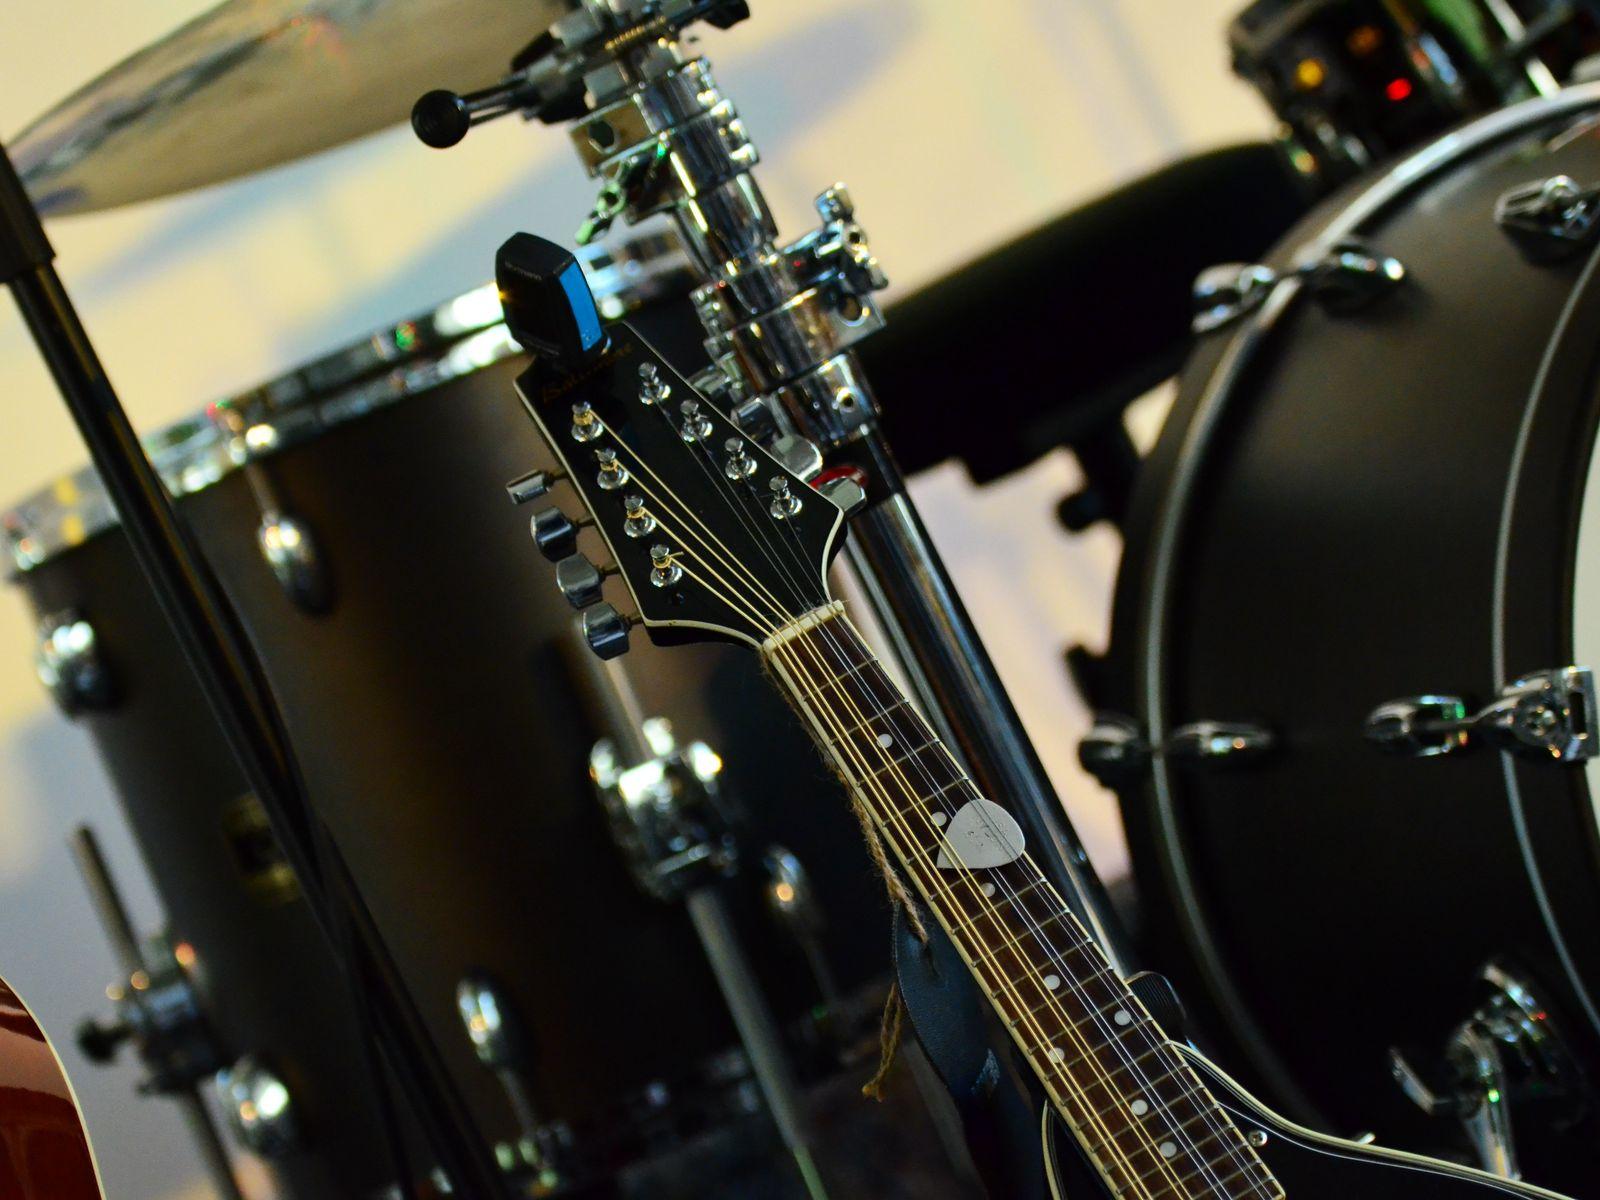 1600x1200 Wallpaper musical instrument, music, percussion, guitar